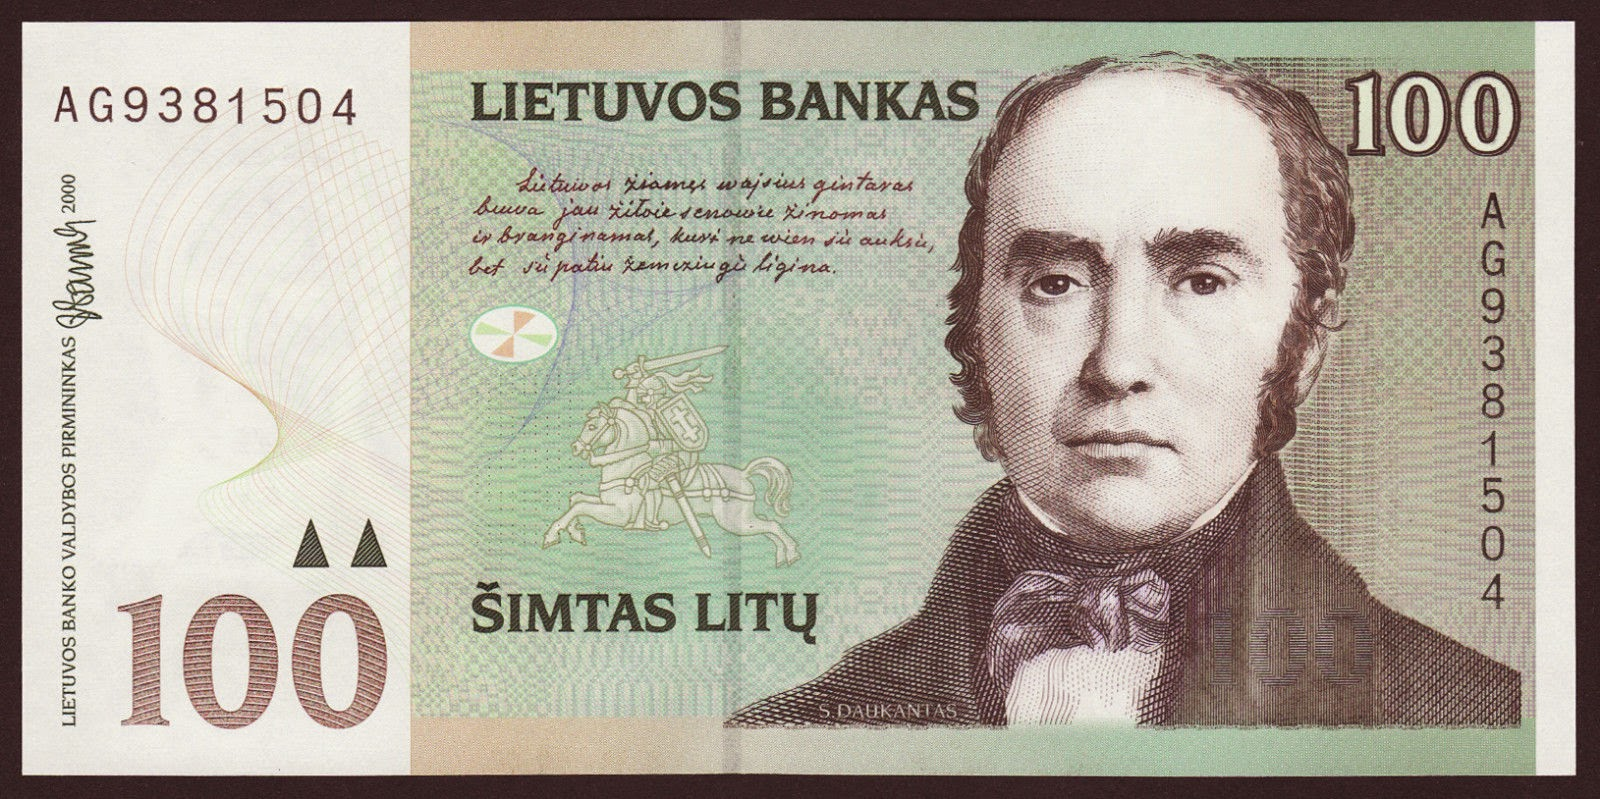 Lithuania 100 Litu banknote, Simonas Daukantas